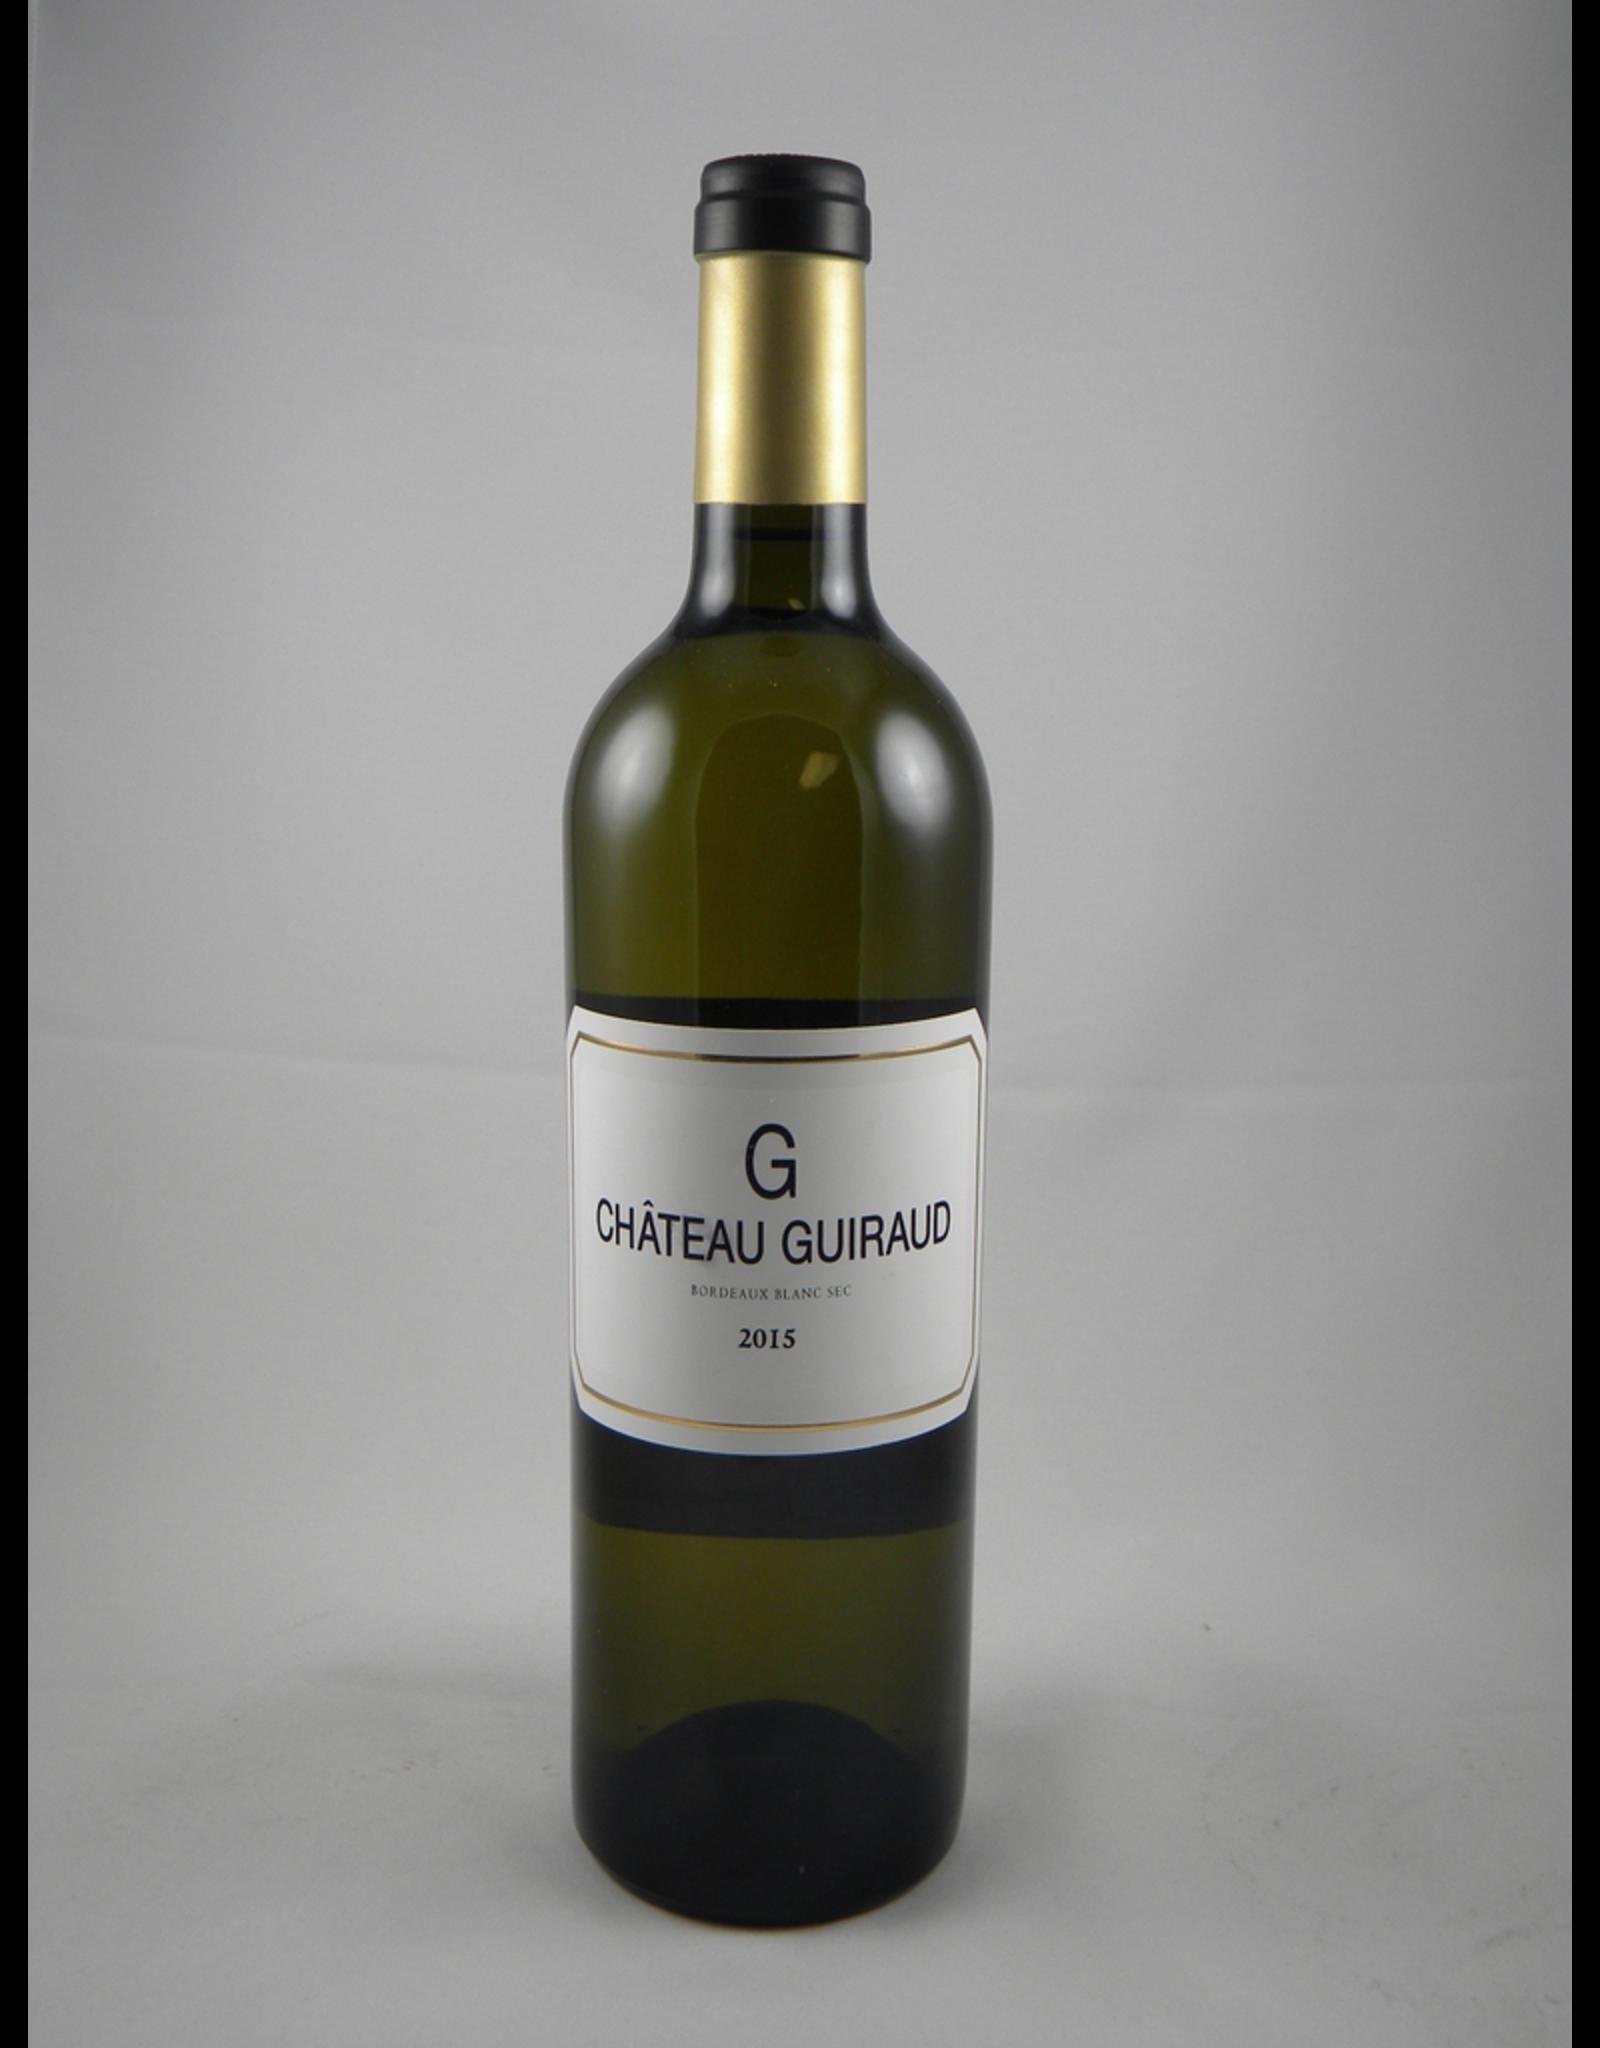 Chateau Guiraud G Bordeaux Blanc Sec 2019